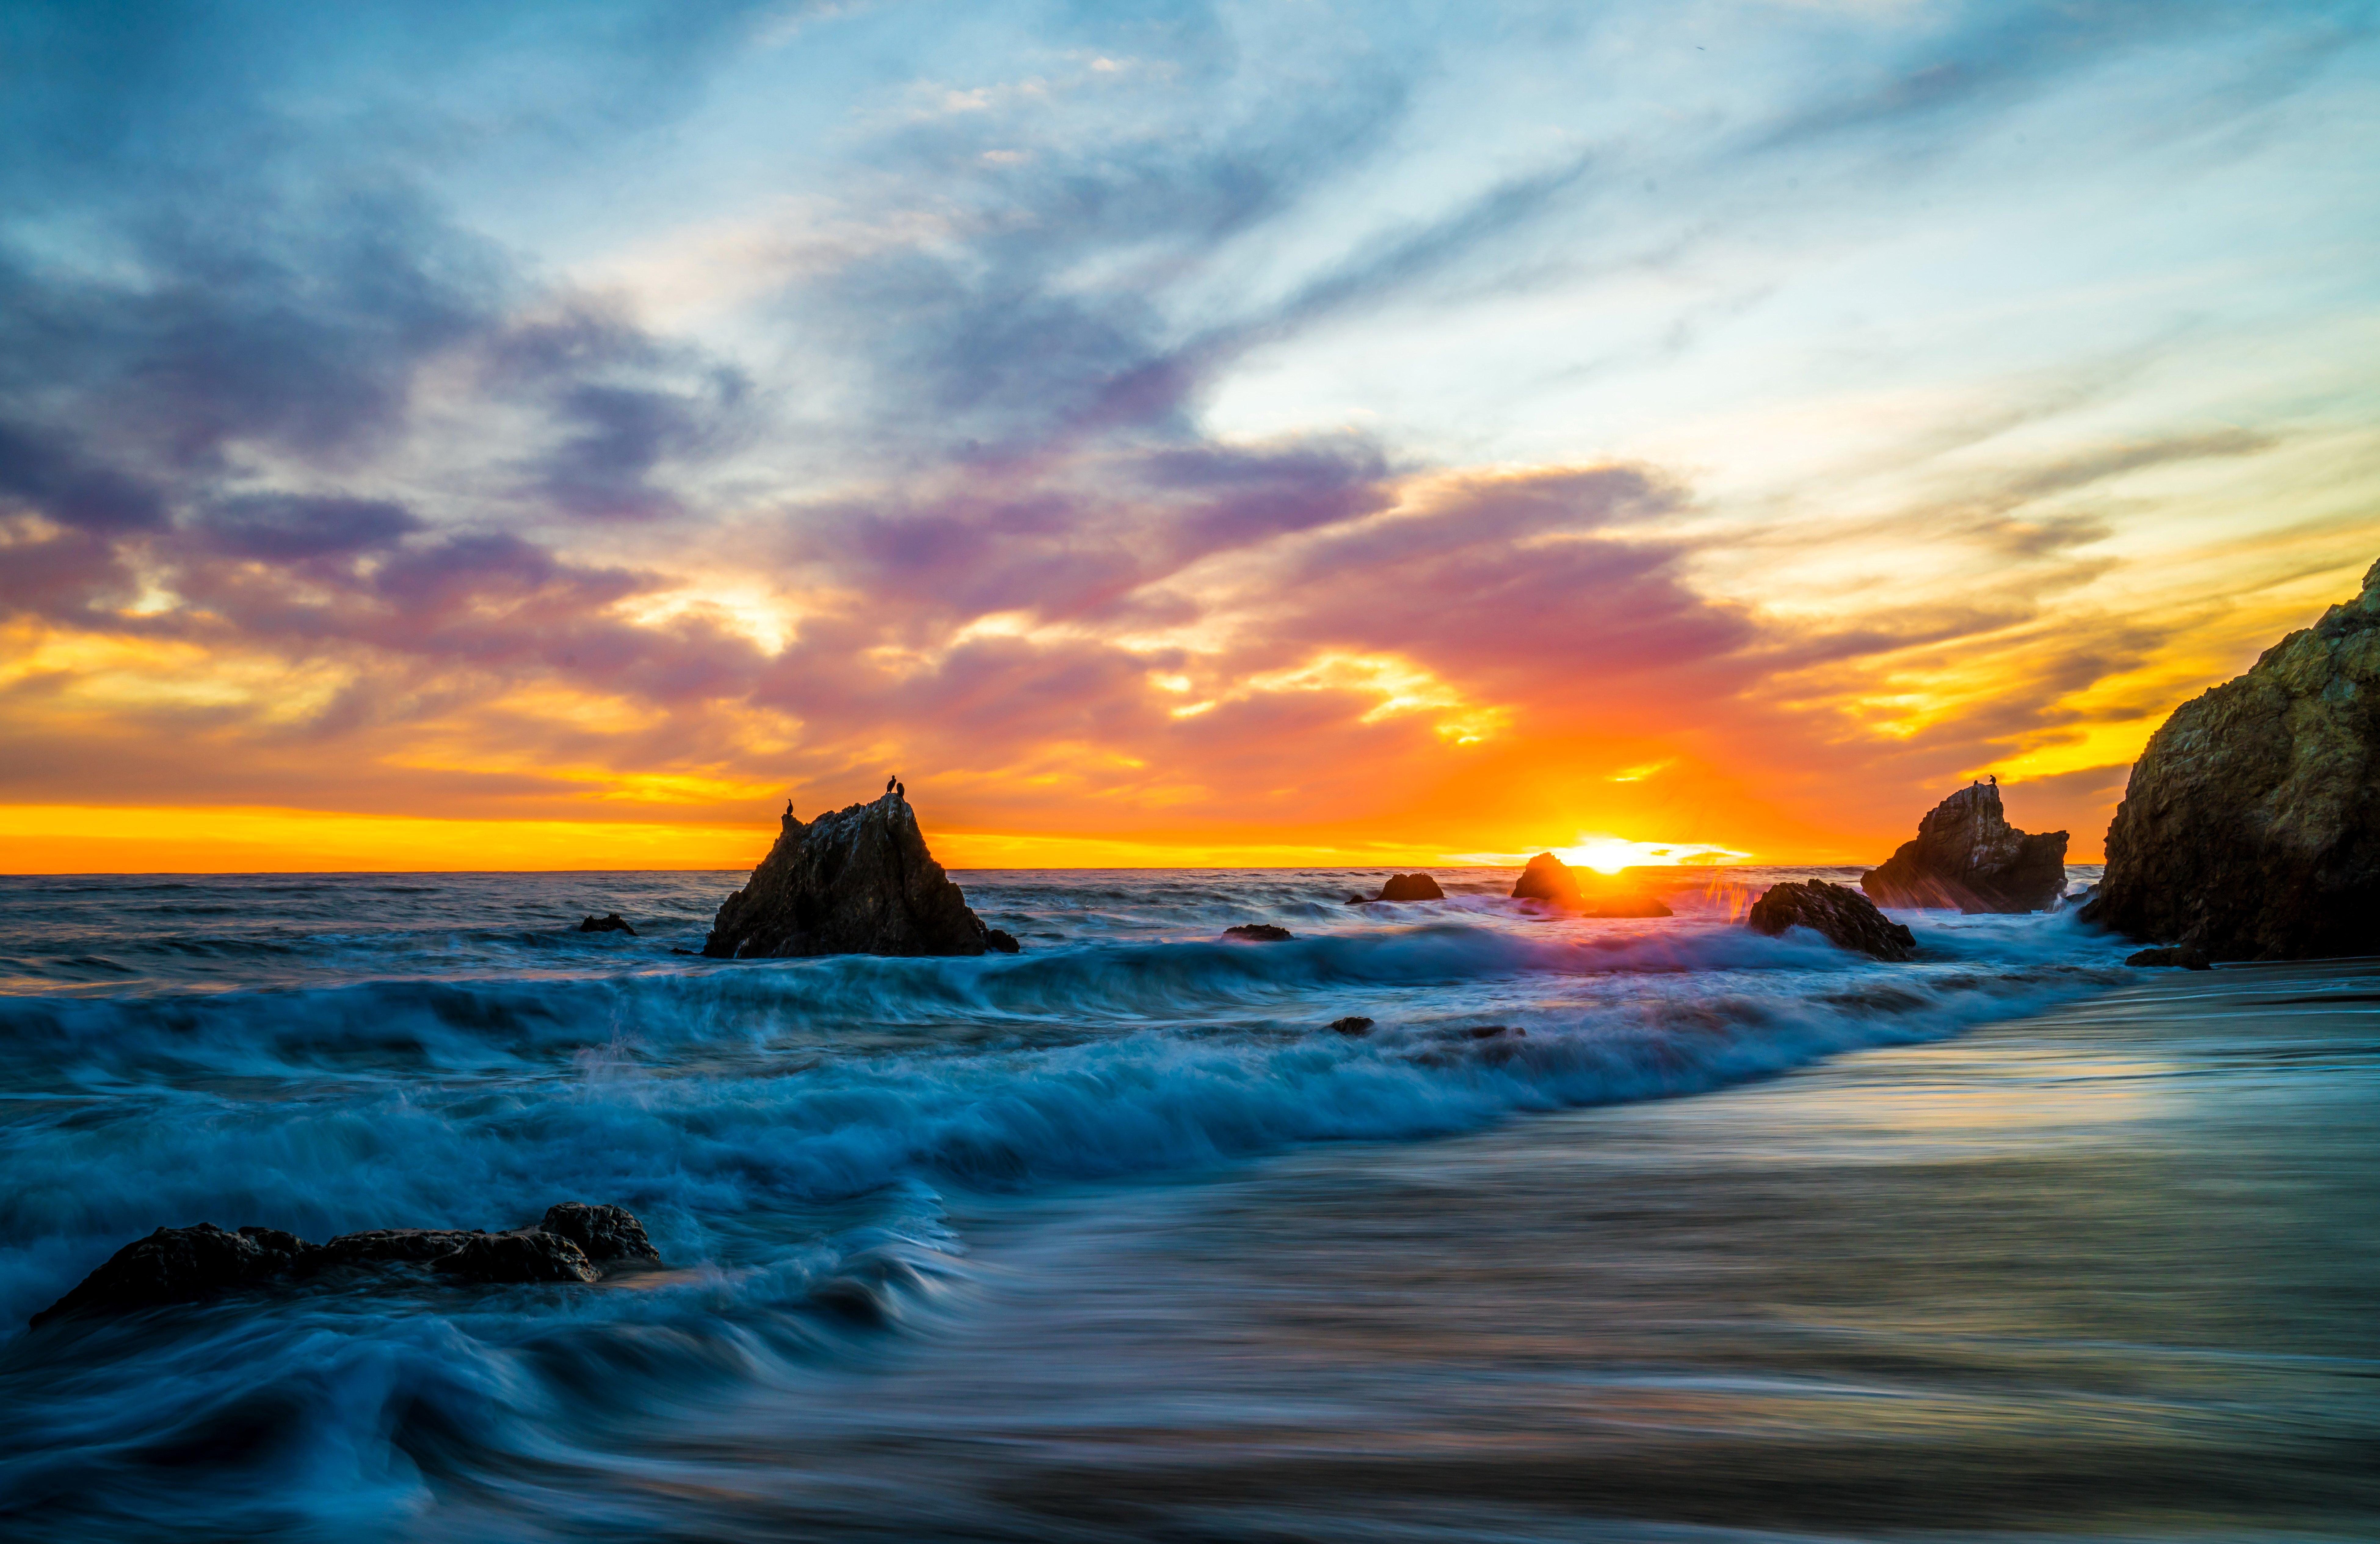 8K Sunset Nature